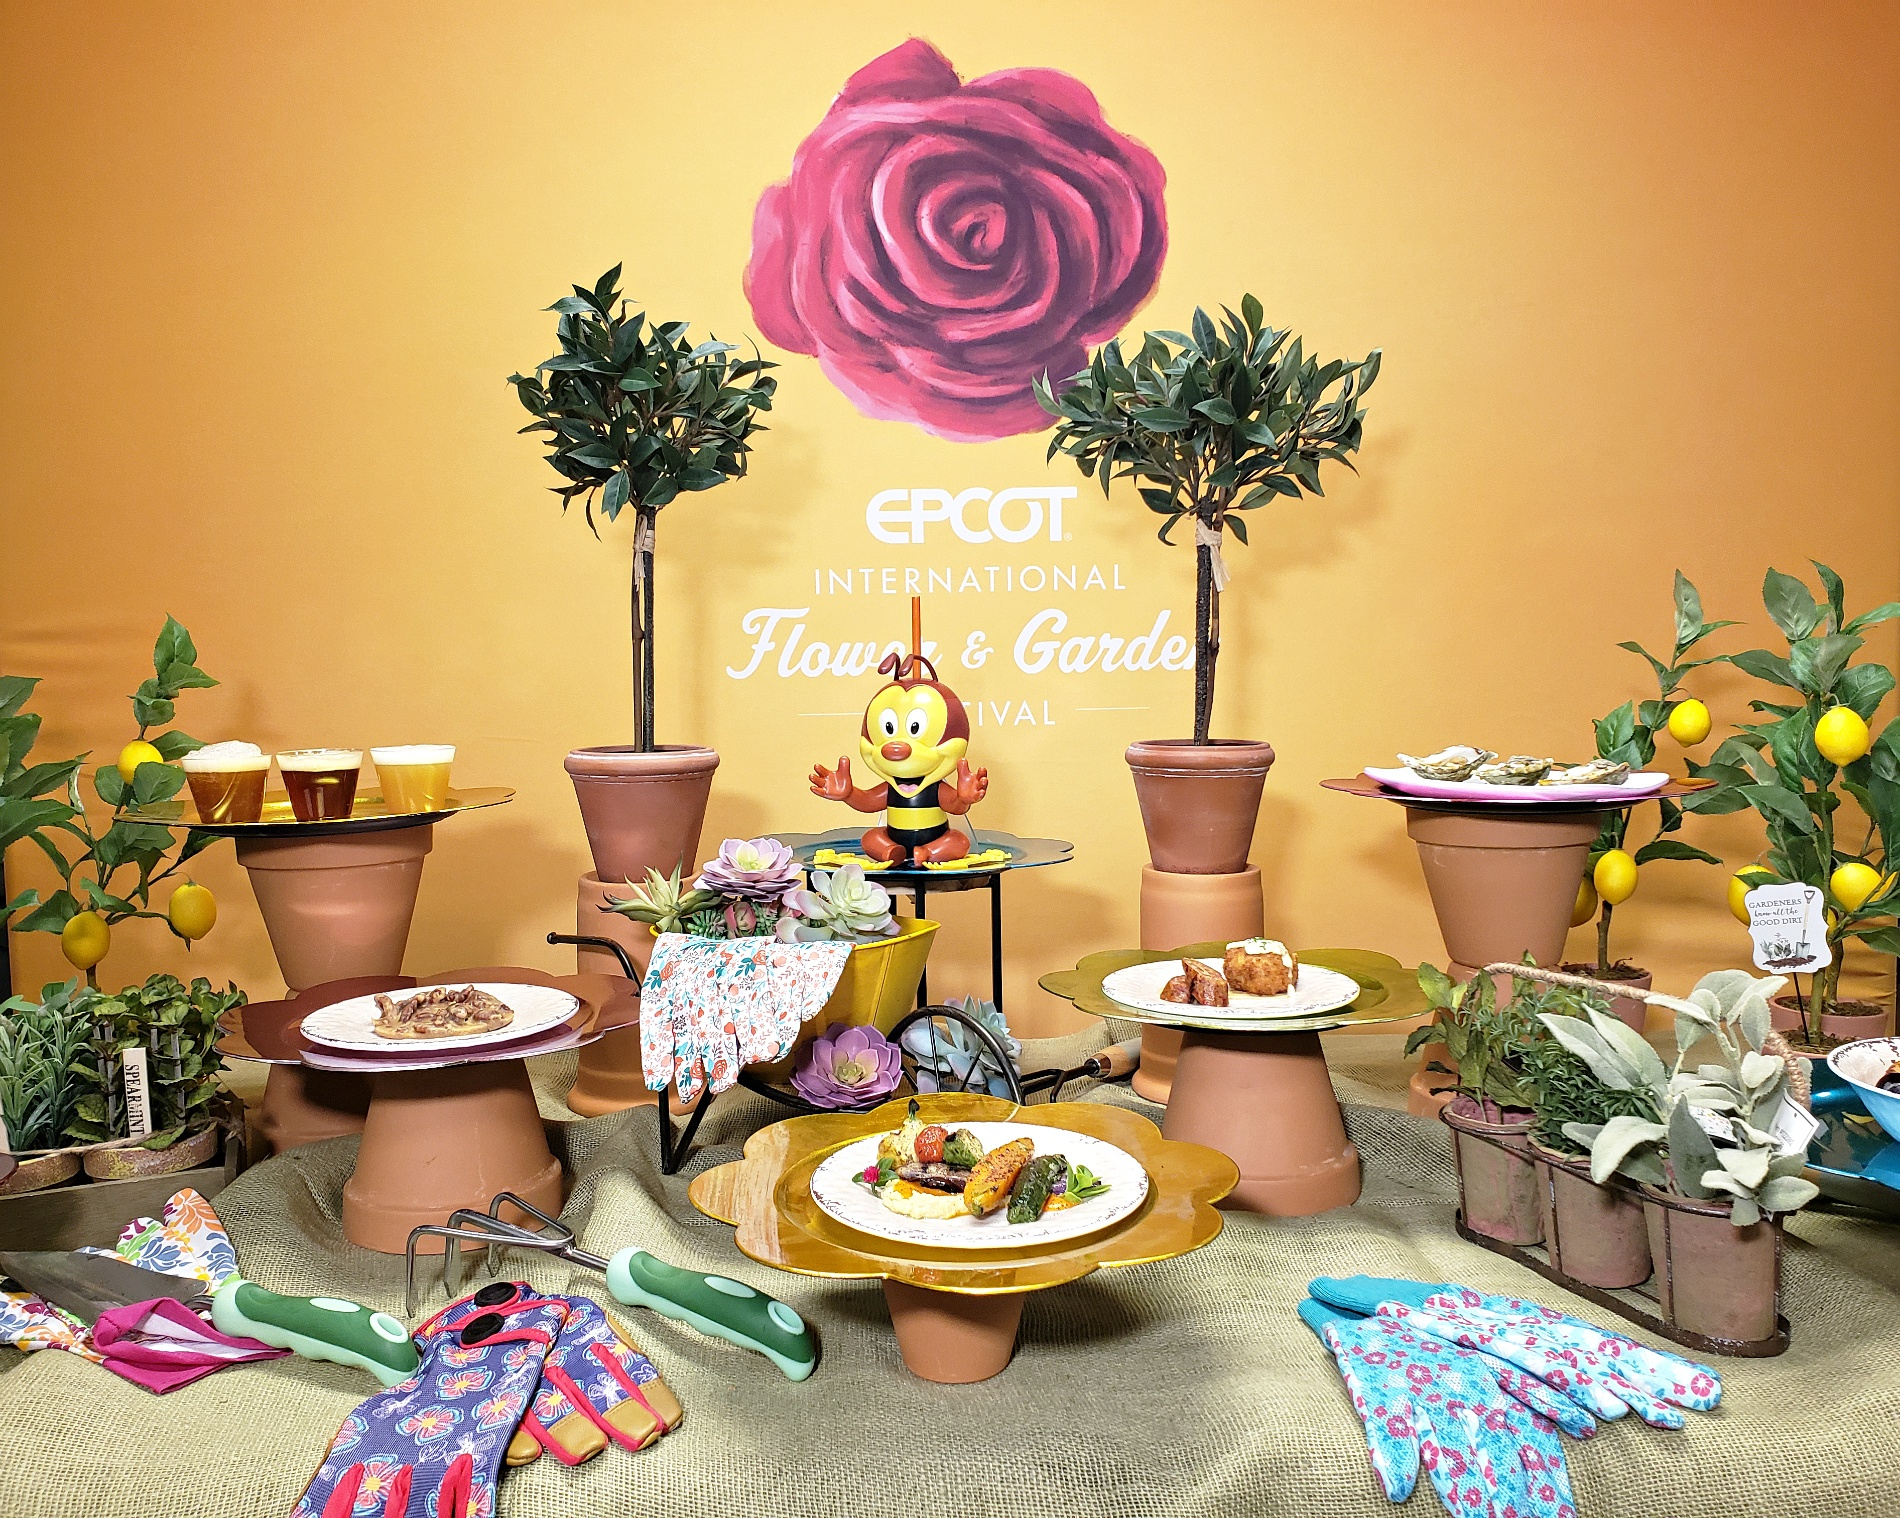 Best Epcot Flower & Garden Festival Eats